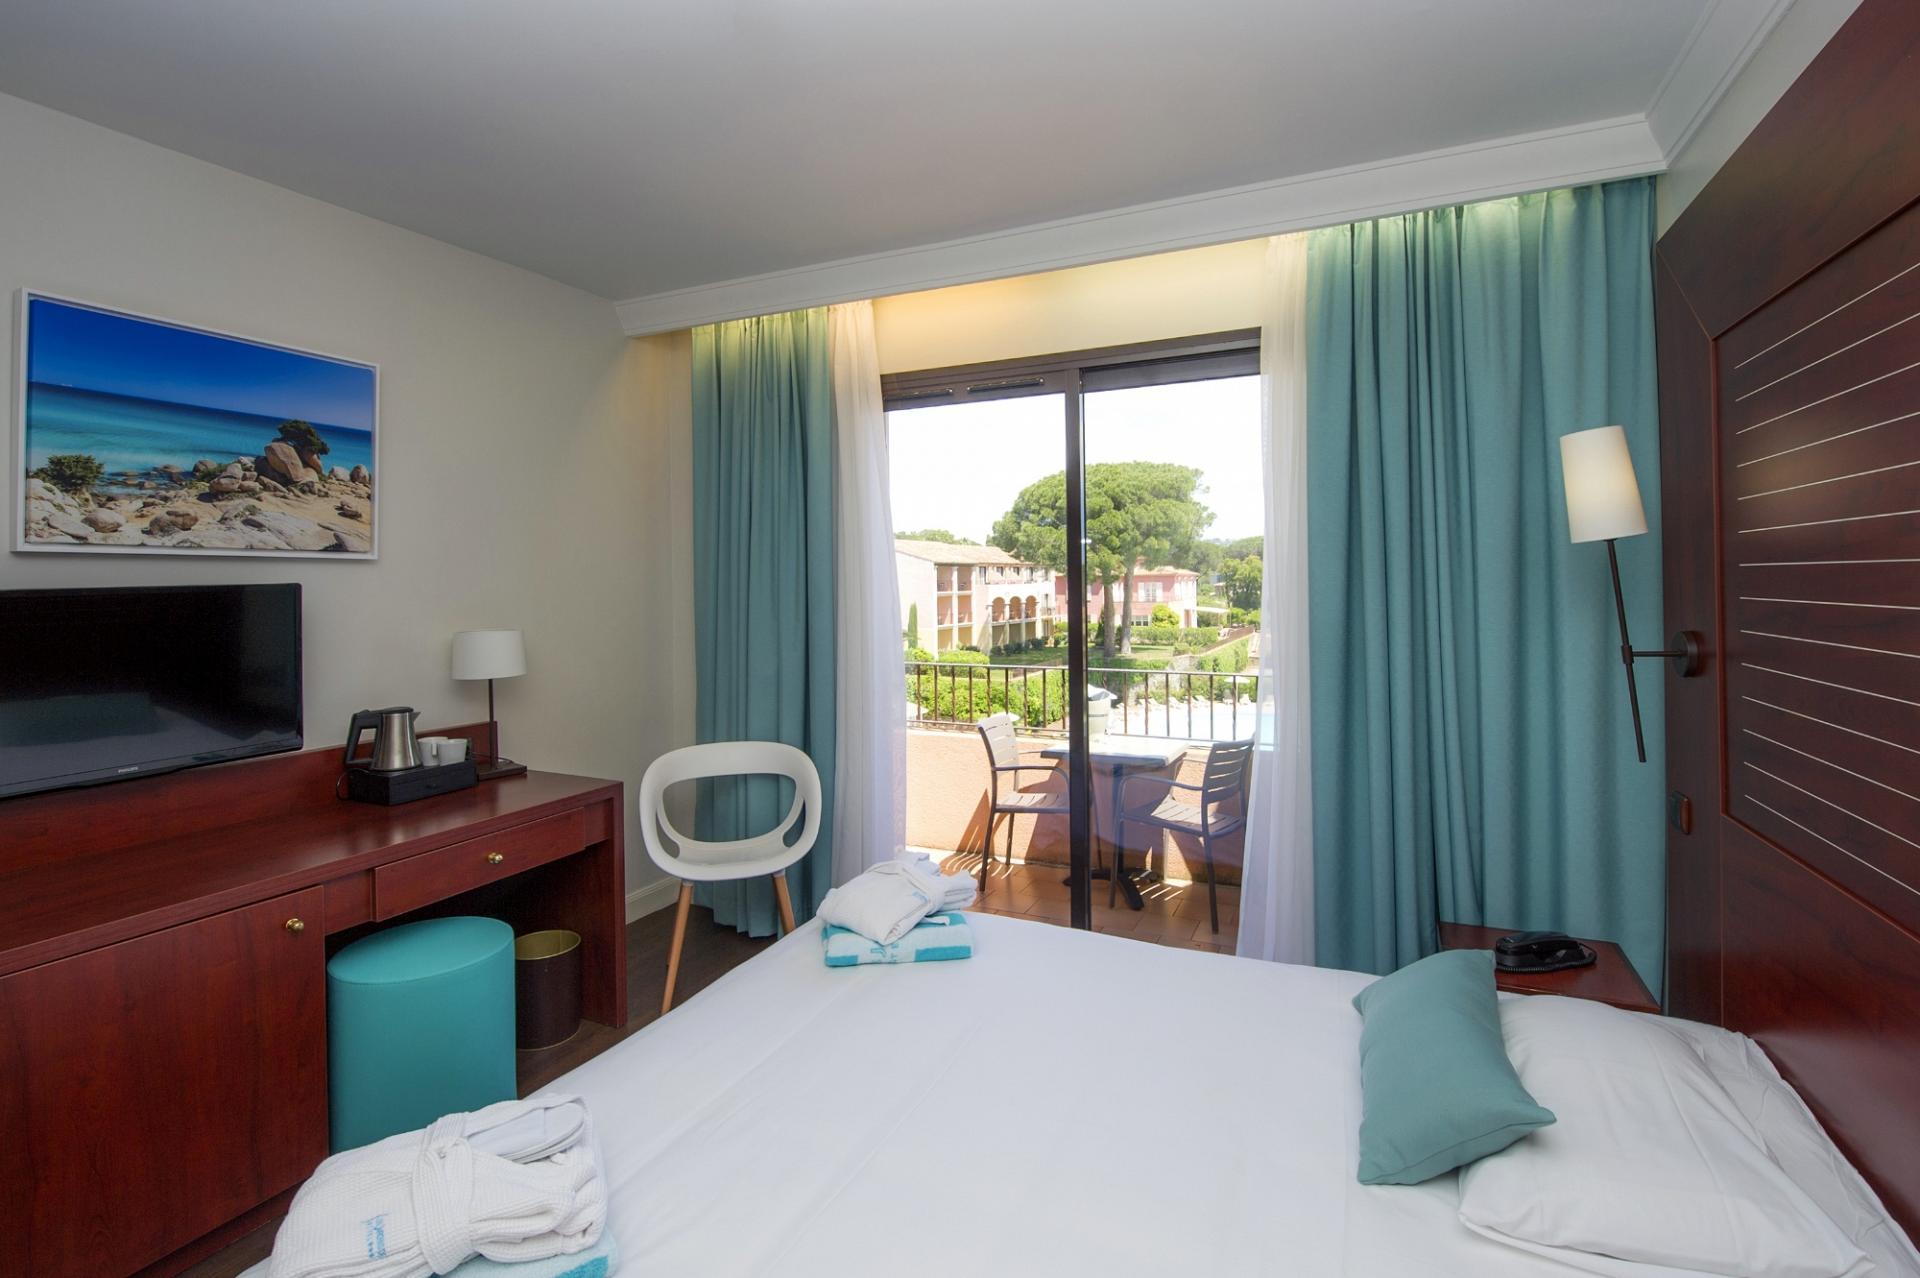 Stay At Hotel Les Jardins De Sainte-Maxime concernant Hotel Les Jardins De Sainte Maxime